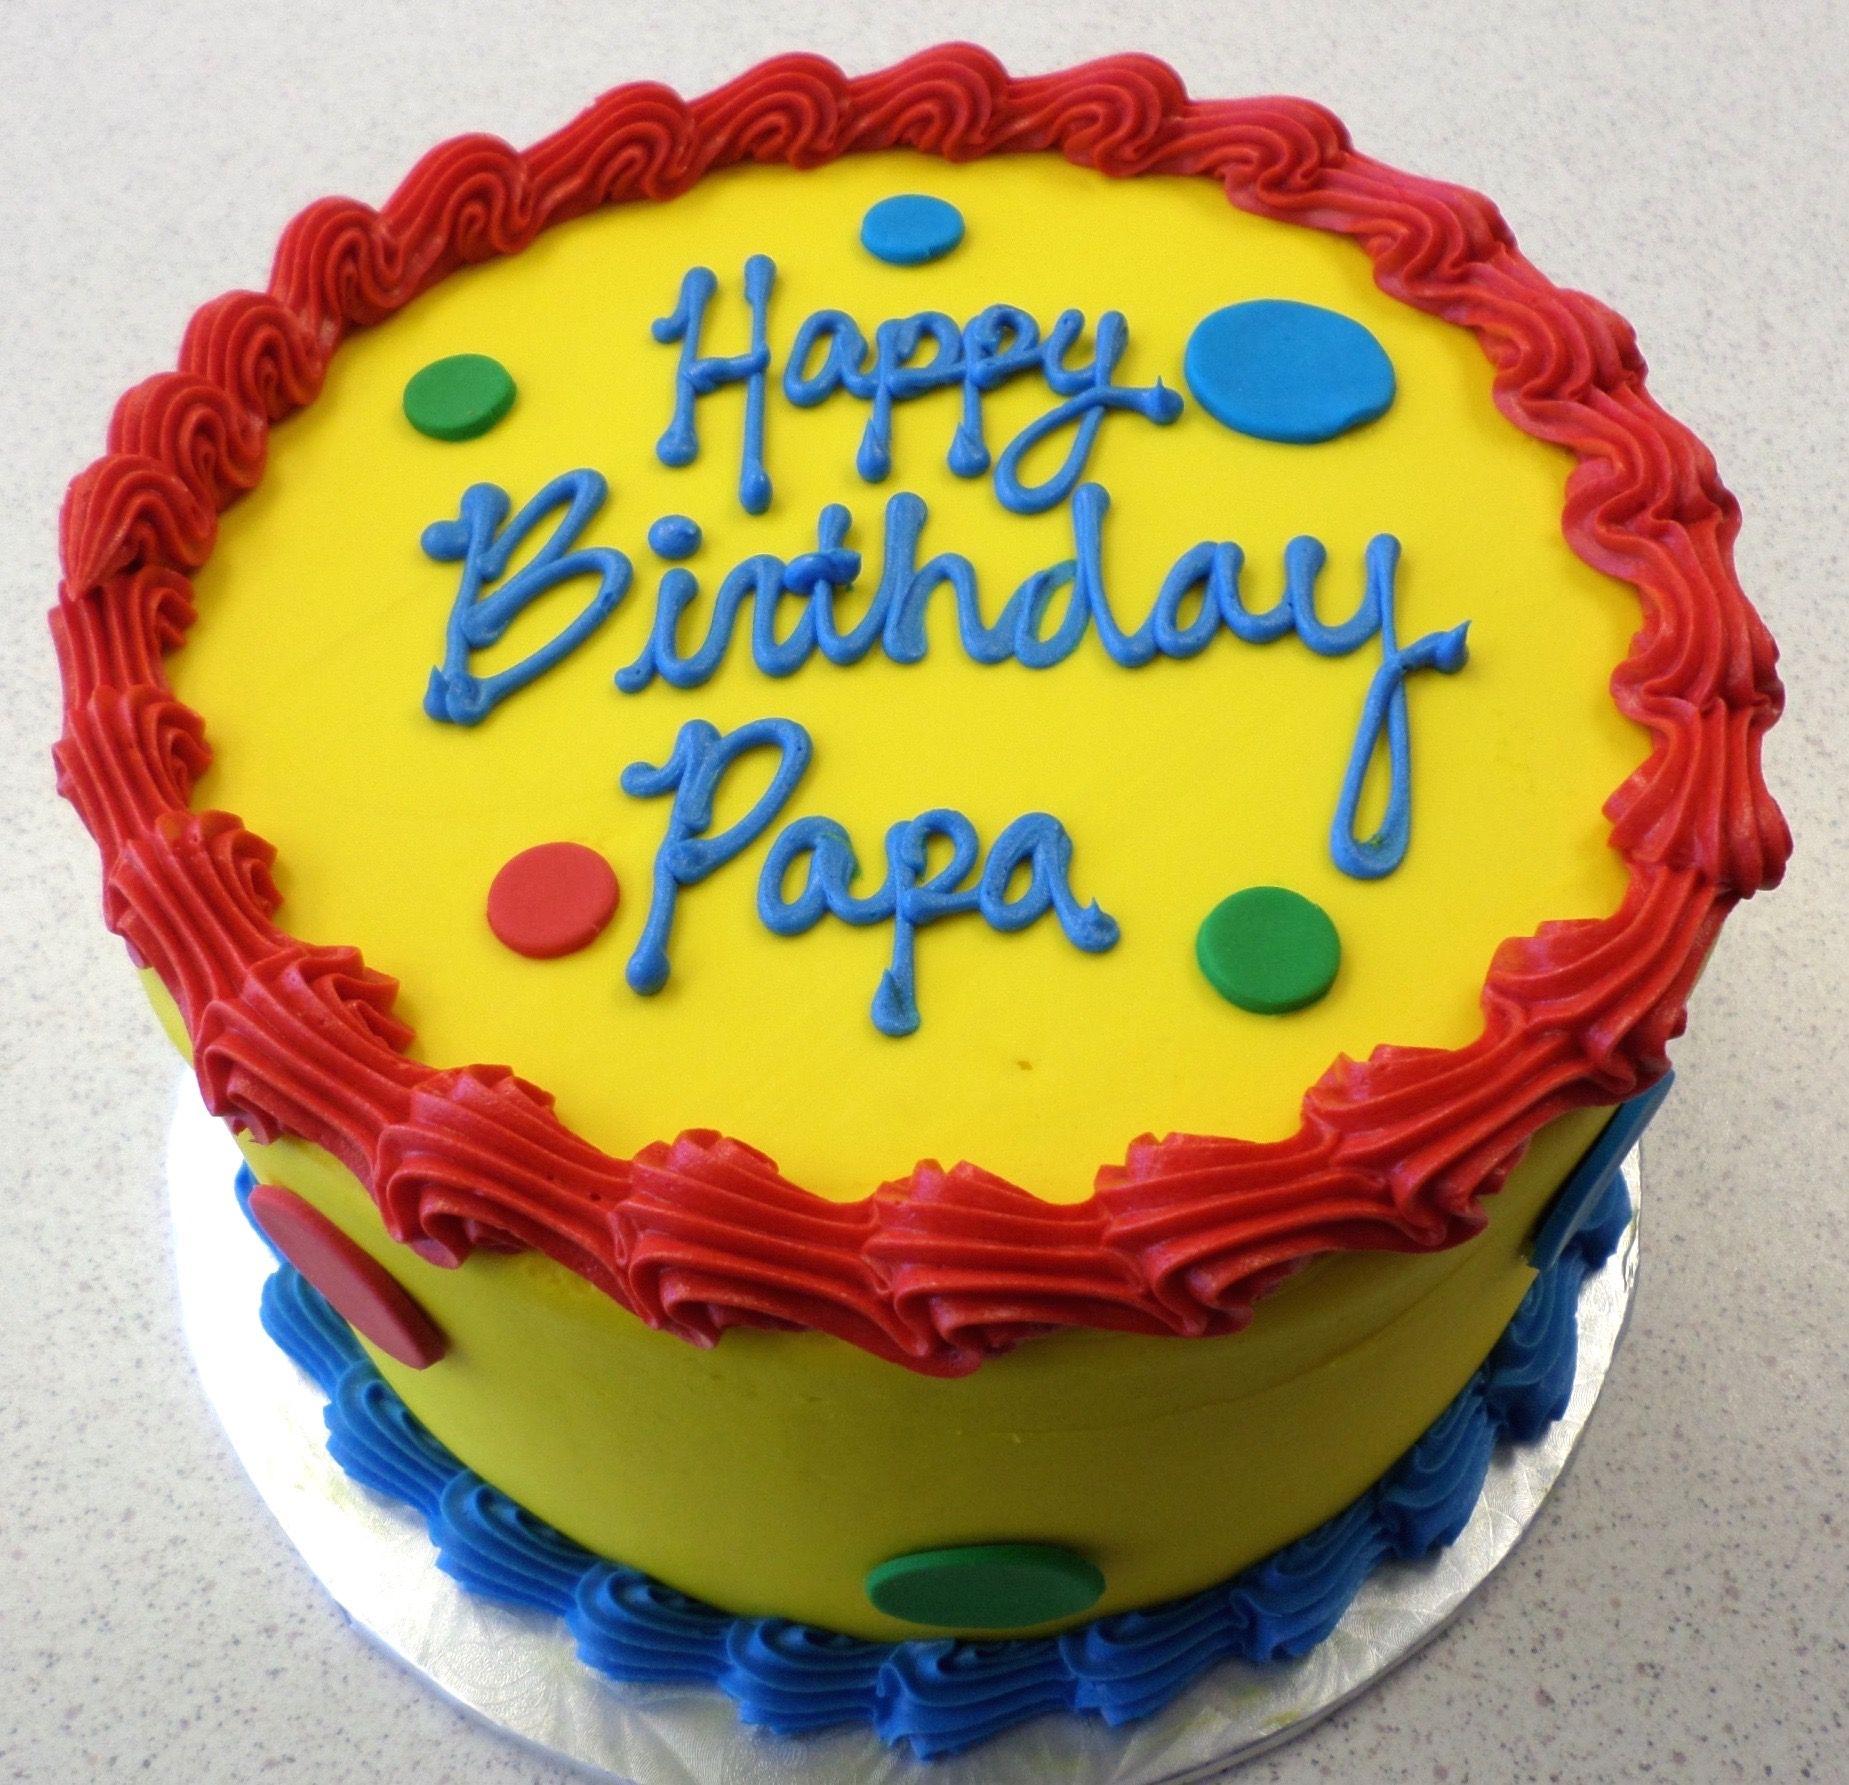 Happy Birthday Papa Cake With Images Happy Birthday Cake